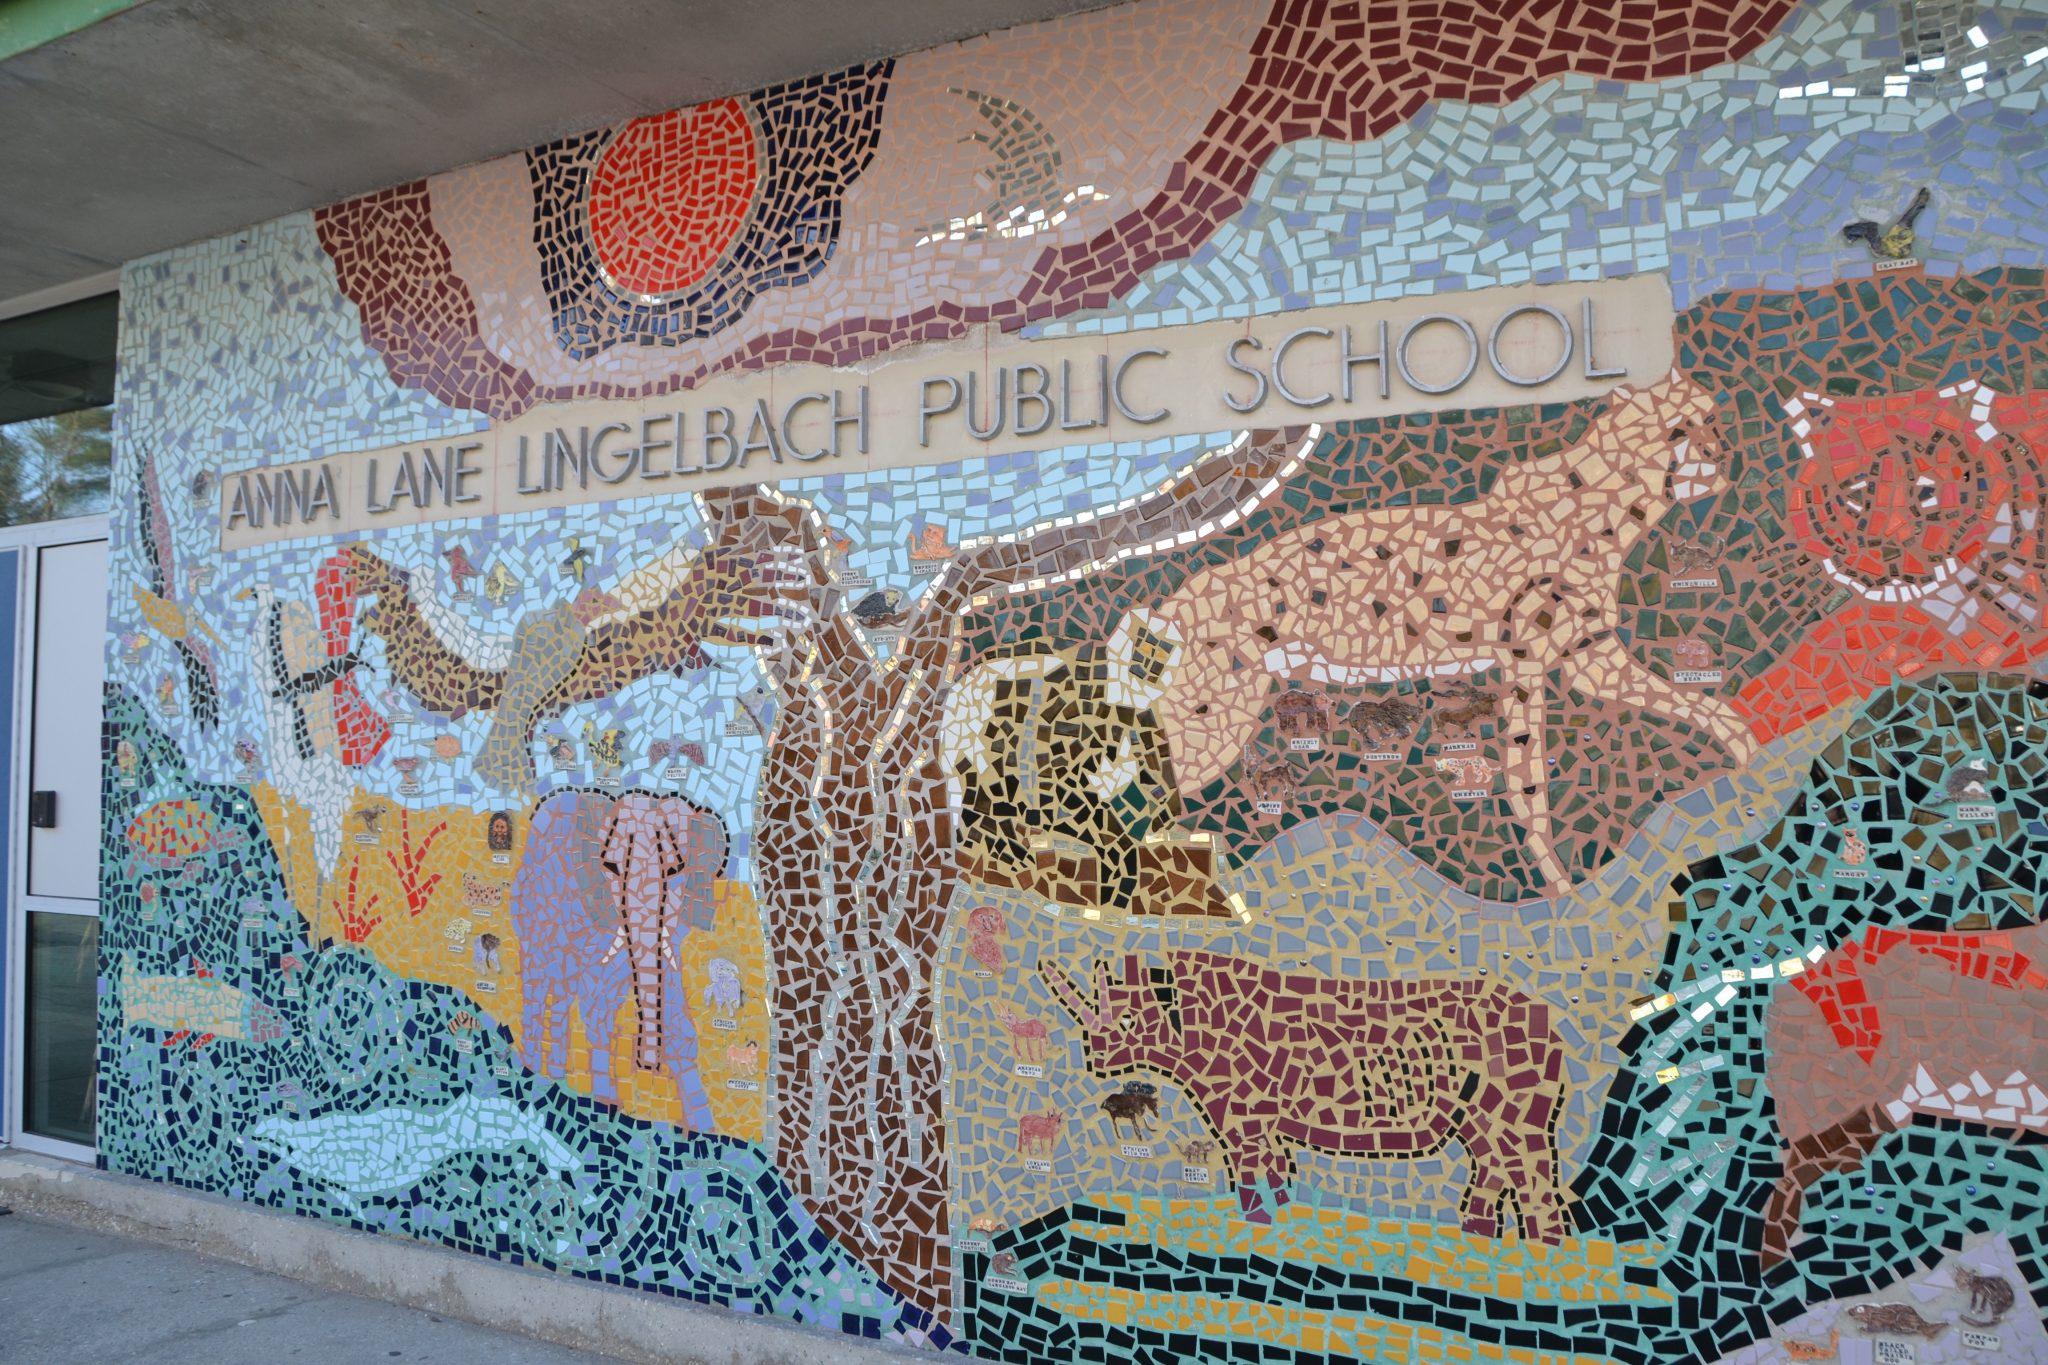 A mosaic wall of a scene of animals at Anna Lane Lingelbach Public School.